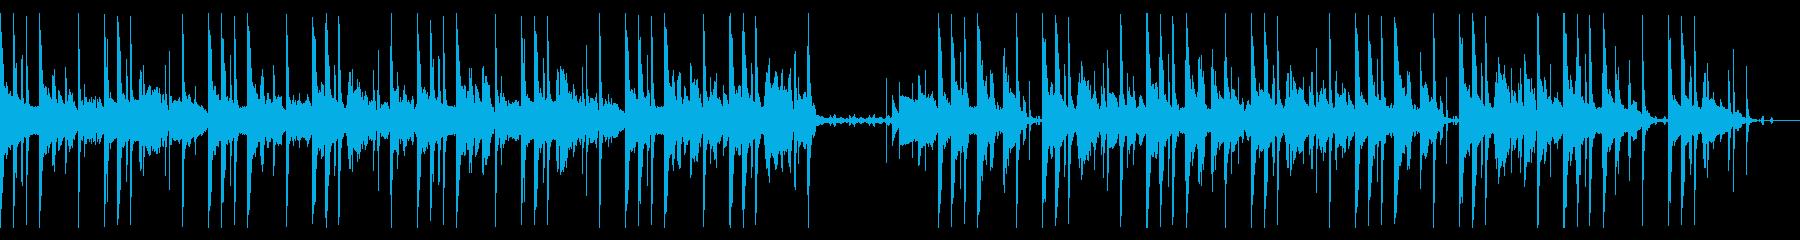 90 BPMの再生済みの波形